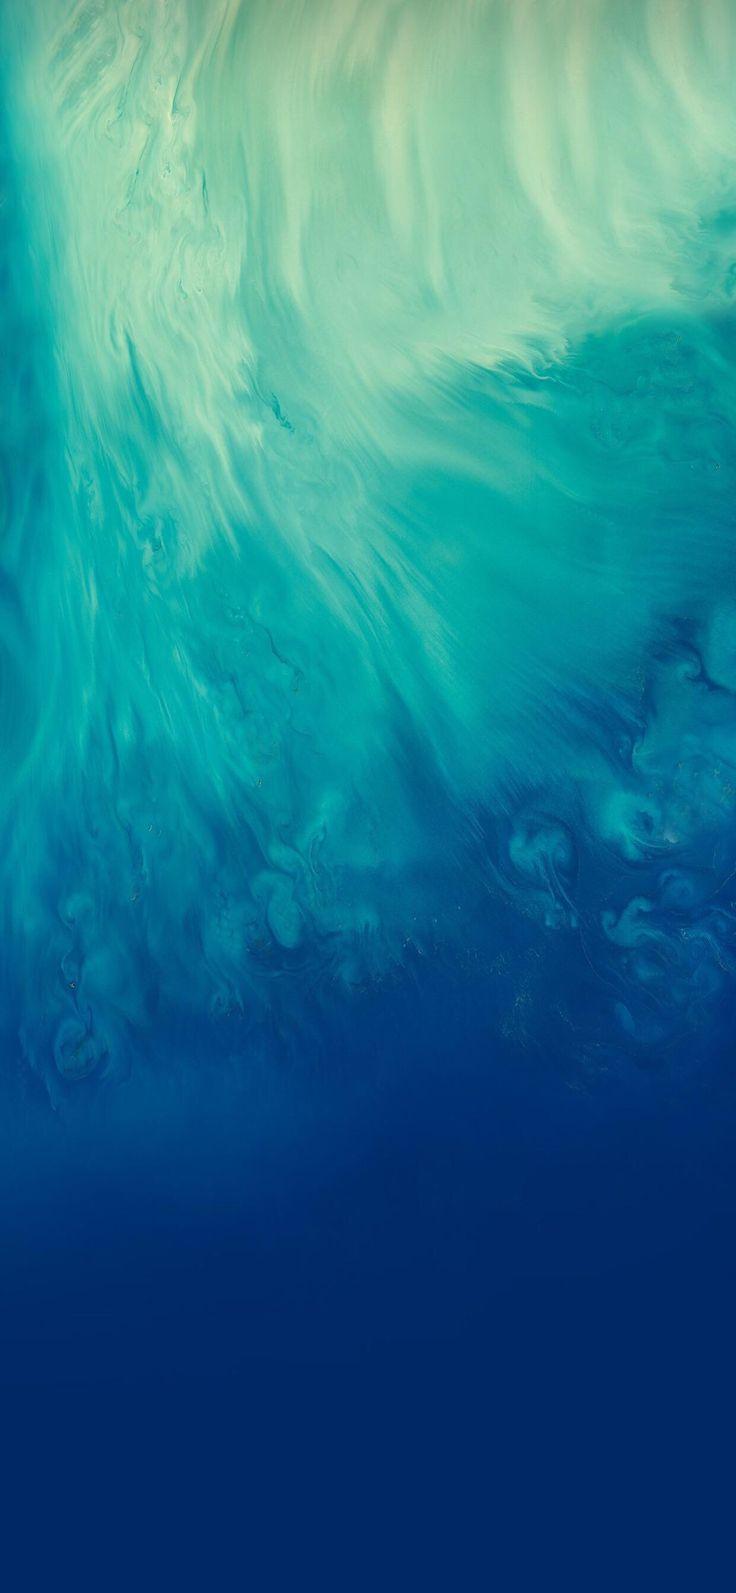 Ios 11 Iphone X Aqua Blue Water Underwater Abstract